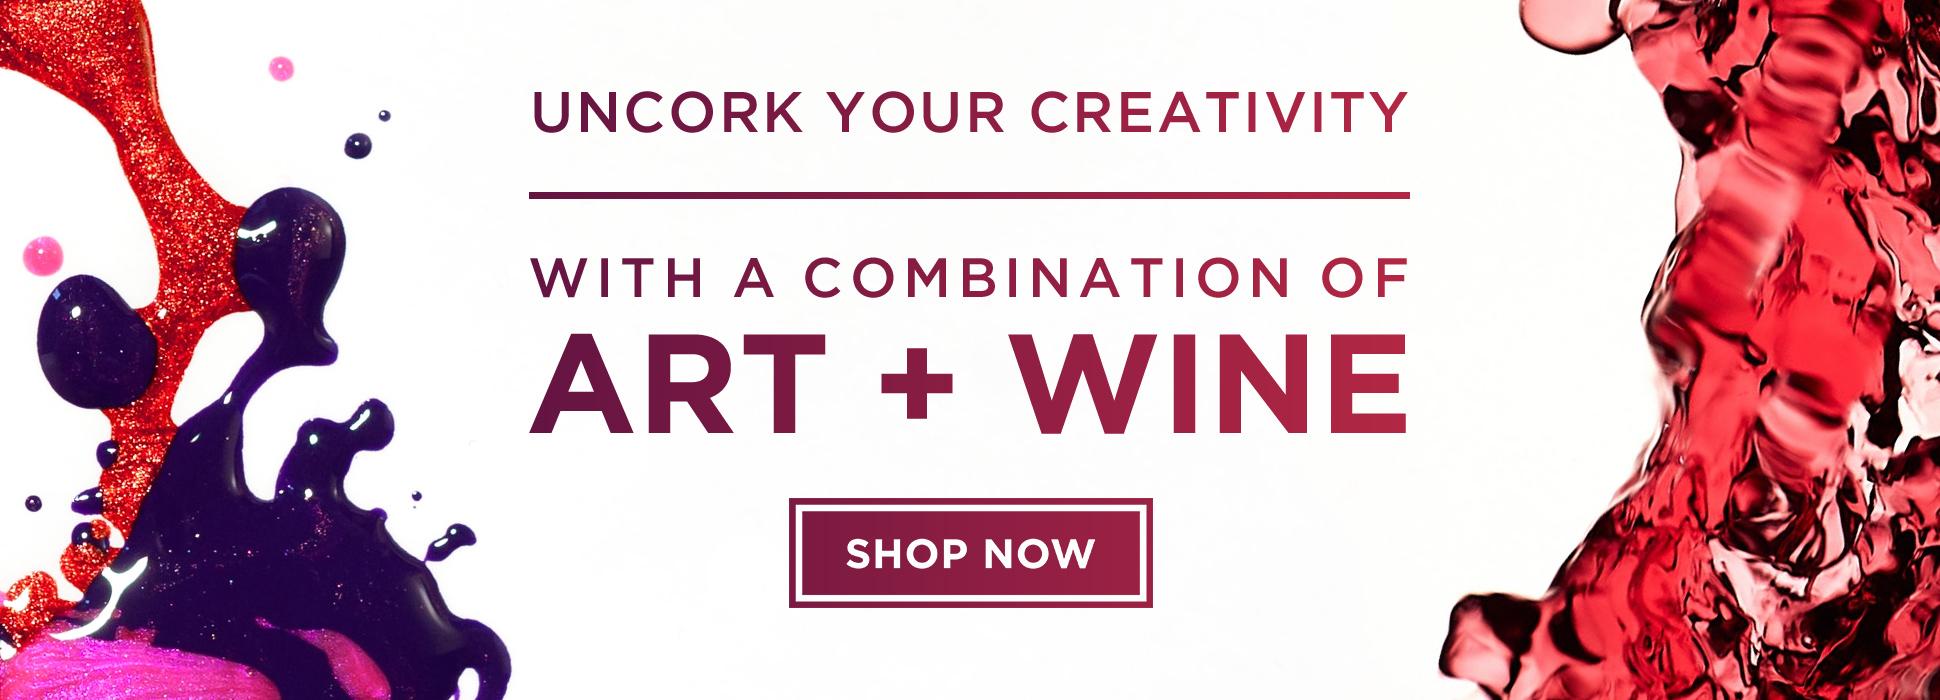 Art & Wine (banners)